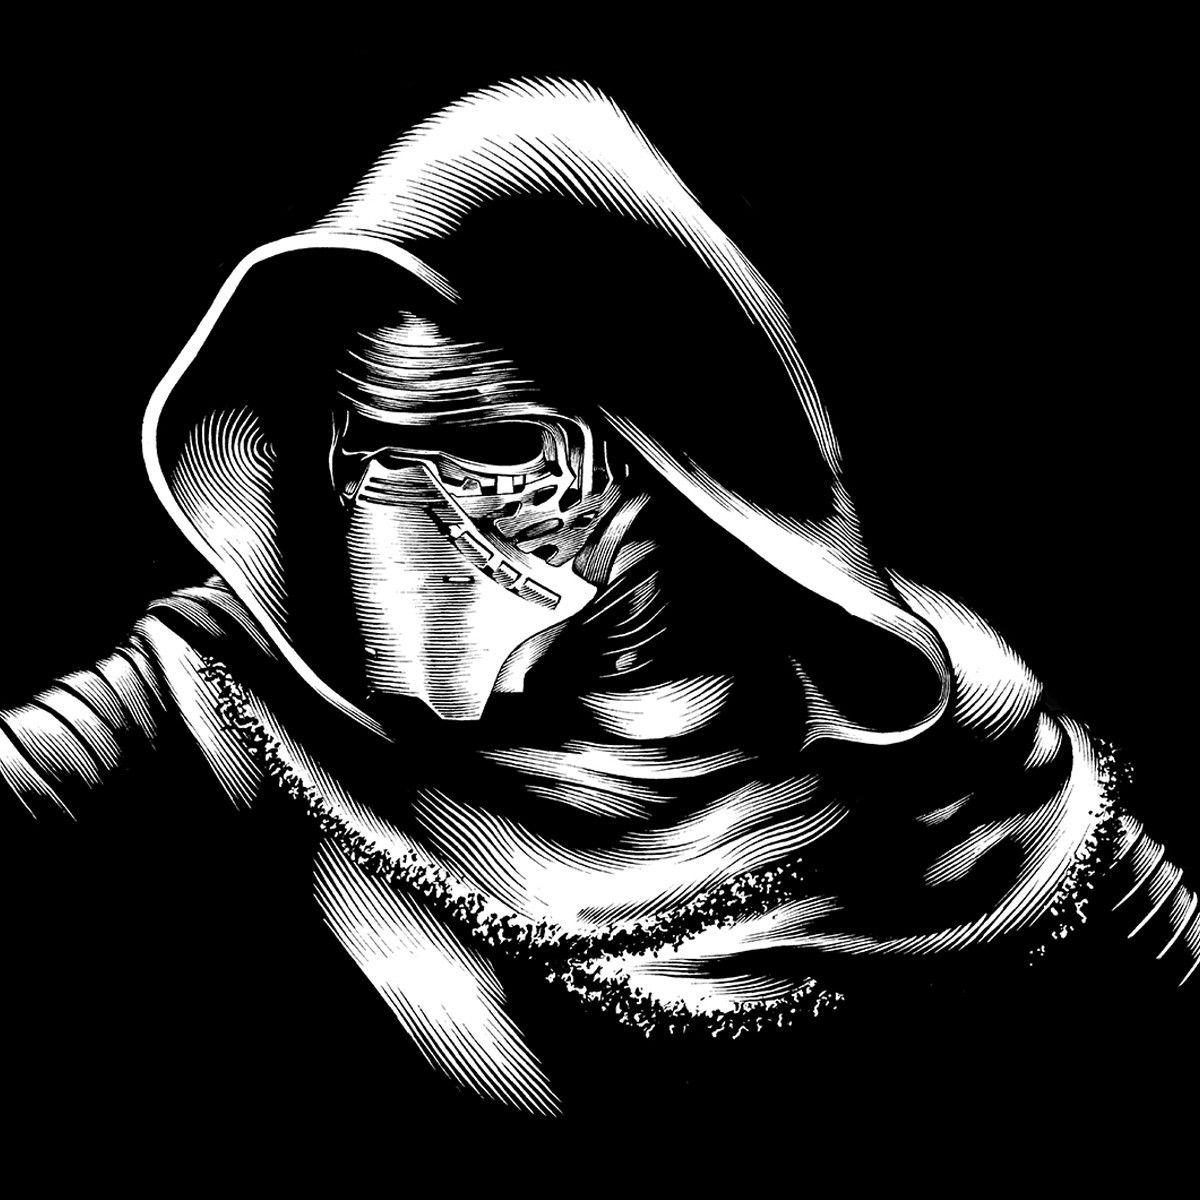 Kylo Ren Black Series Art By Gregory Titus Star Wars Black